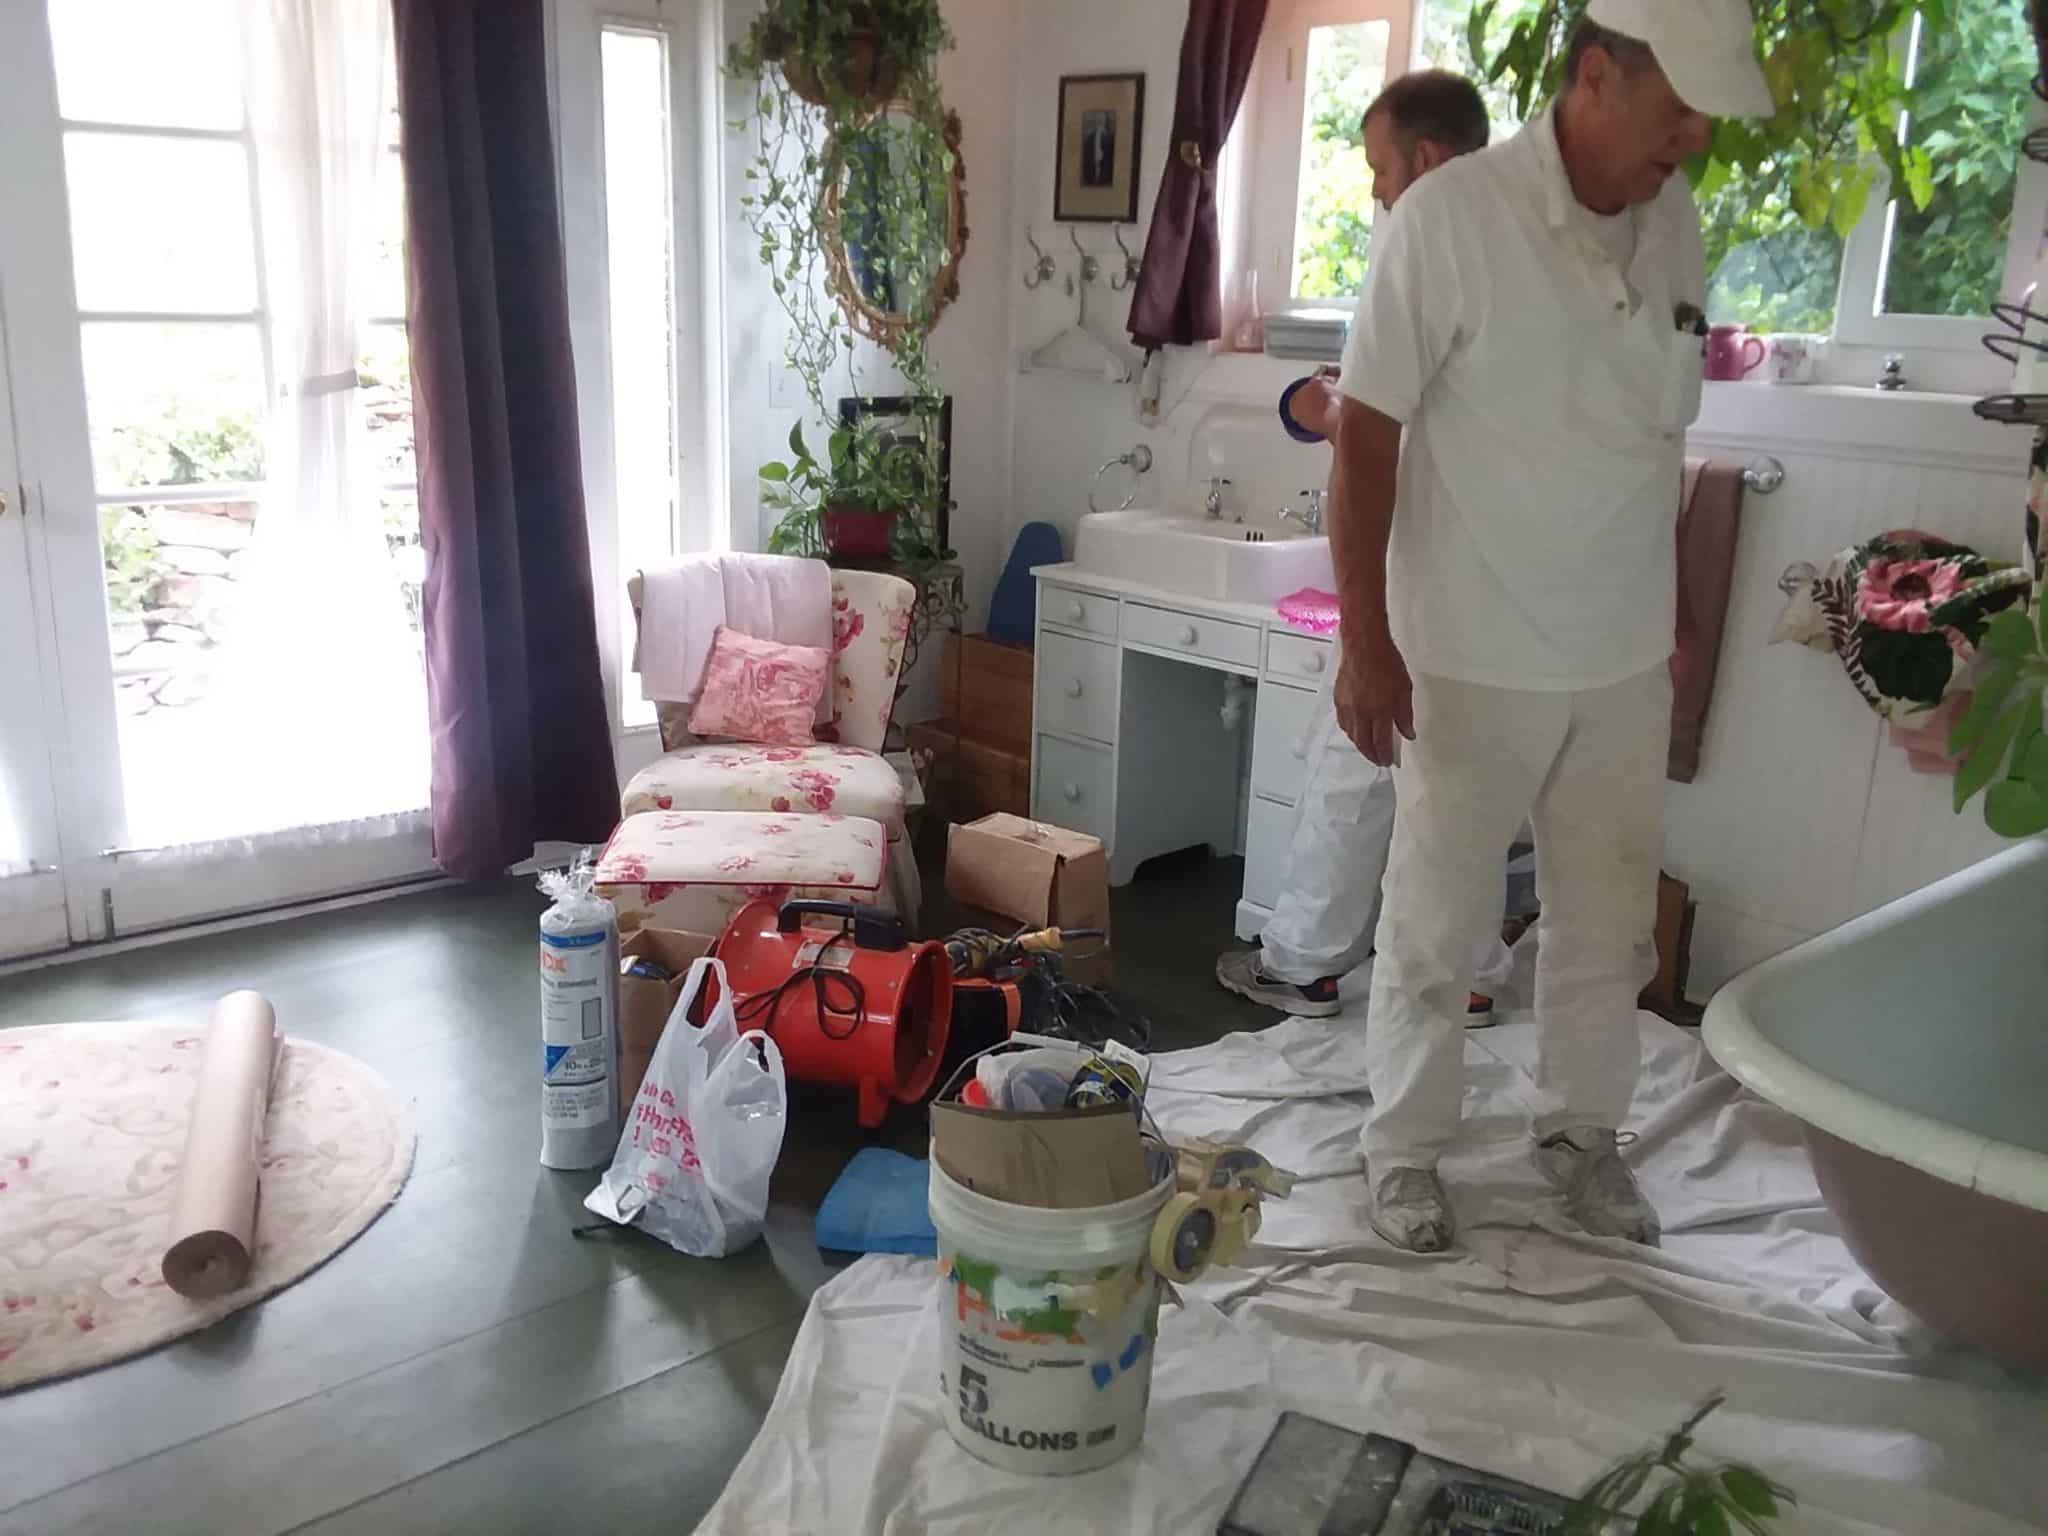 Maid's Back setting up